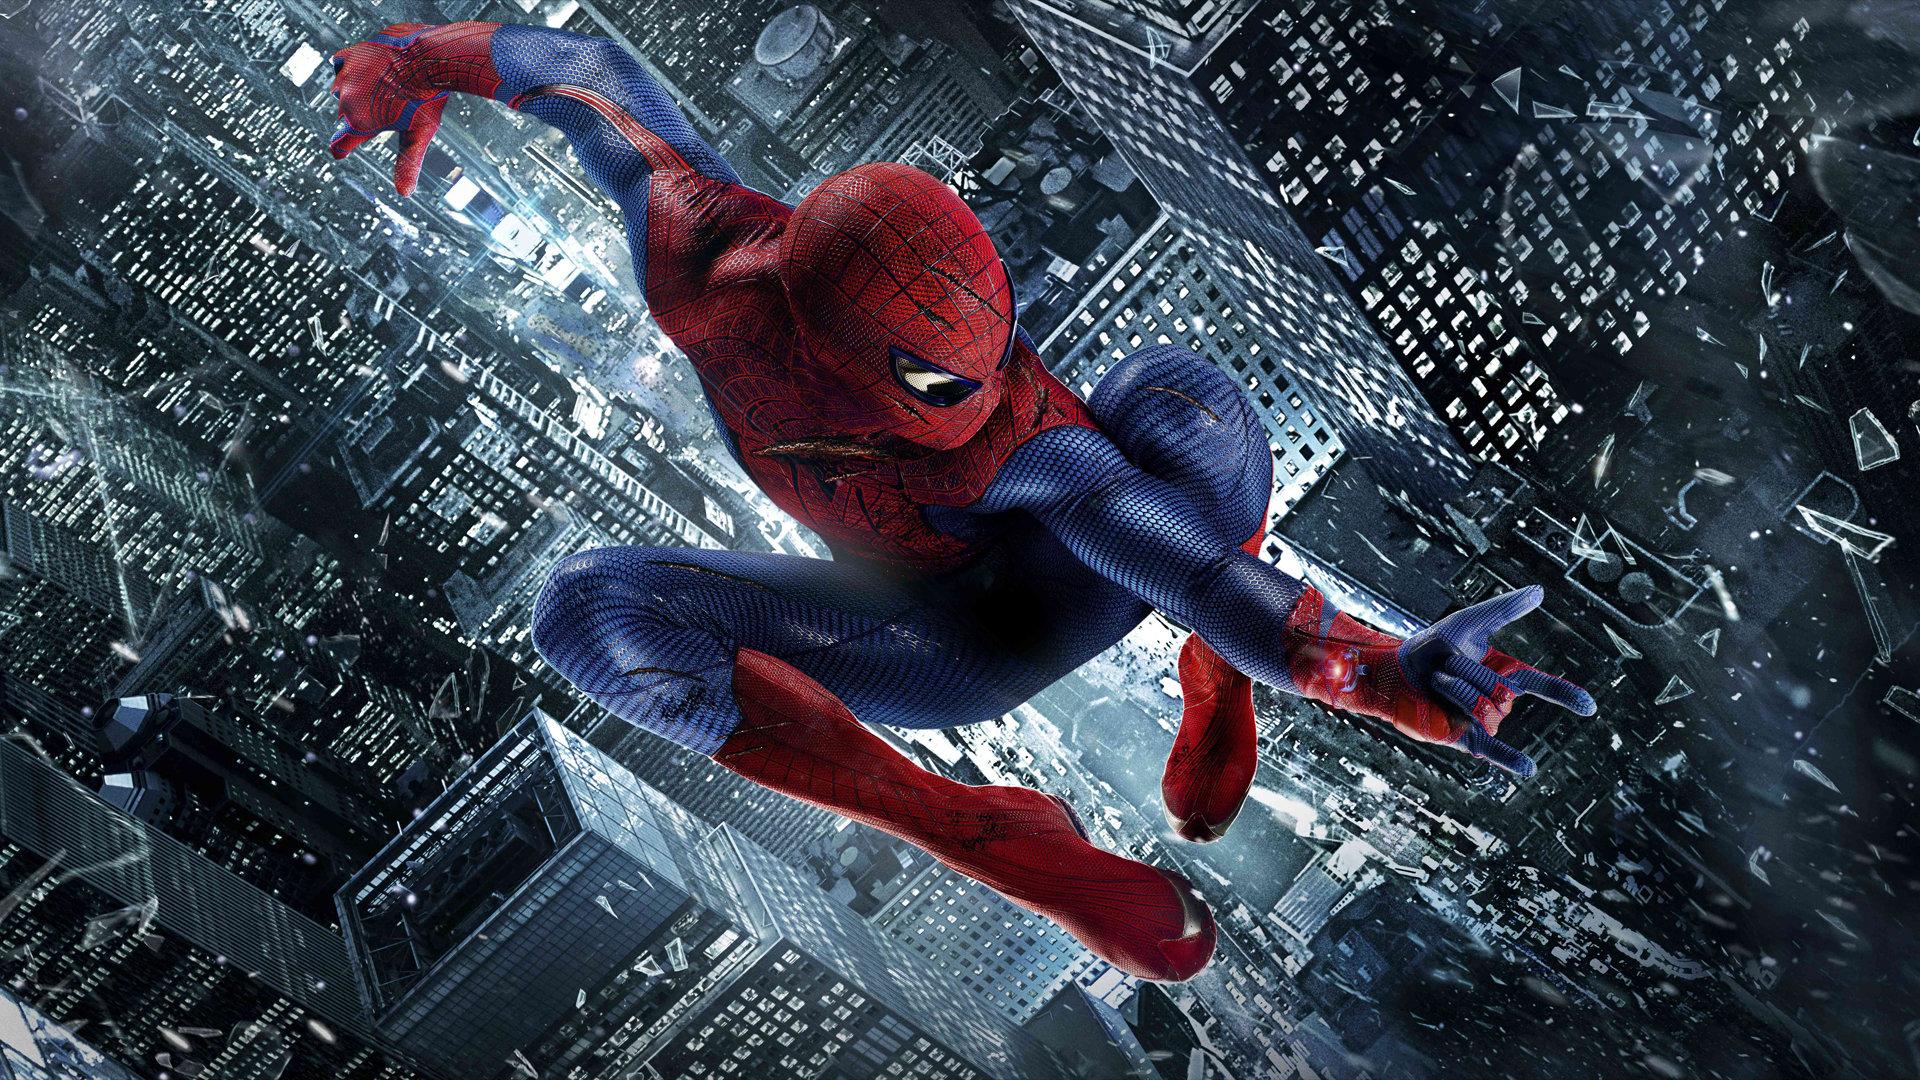 the amazing spiderman spiderman superhero q wallpaper